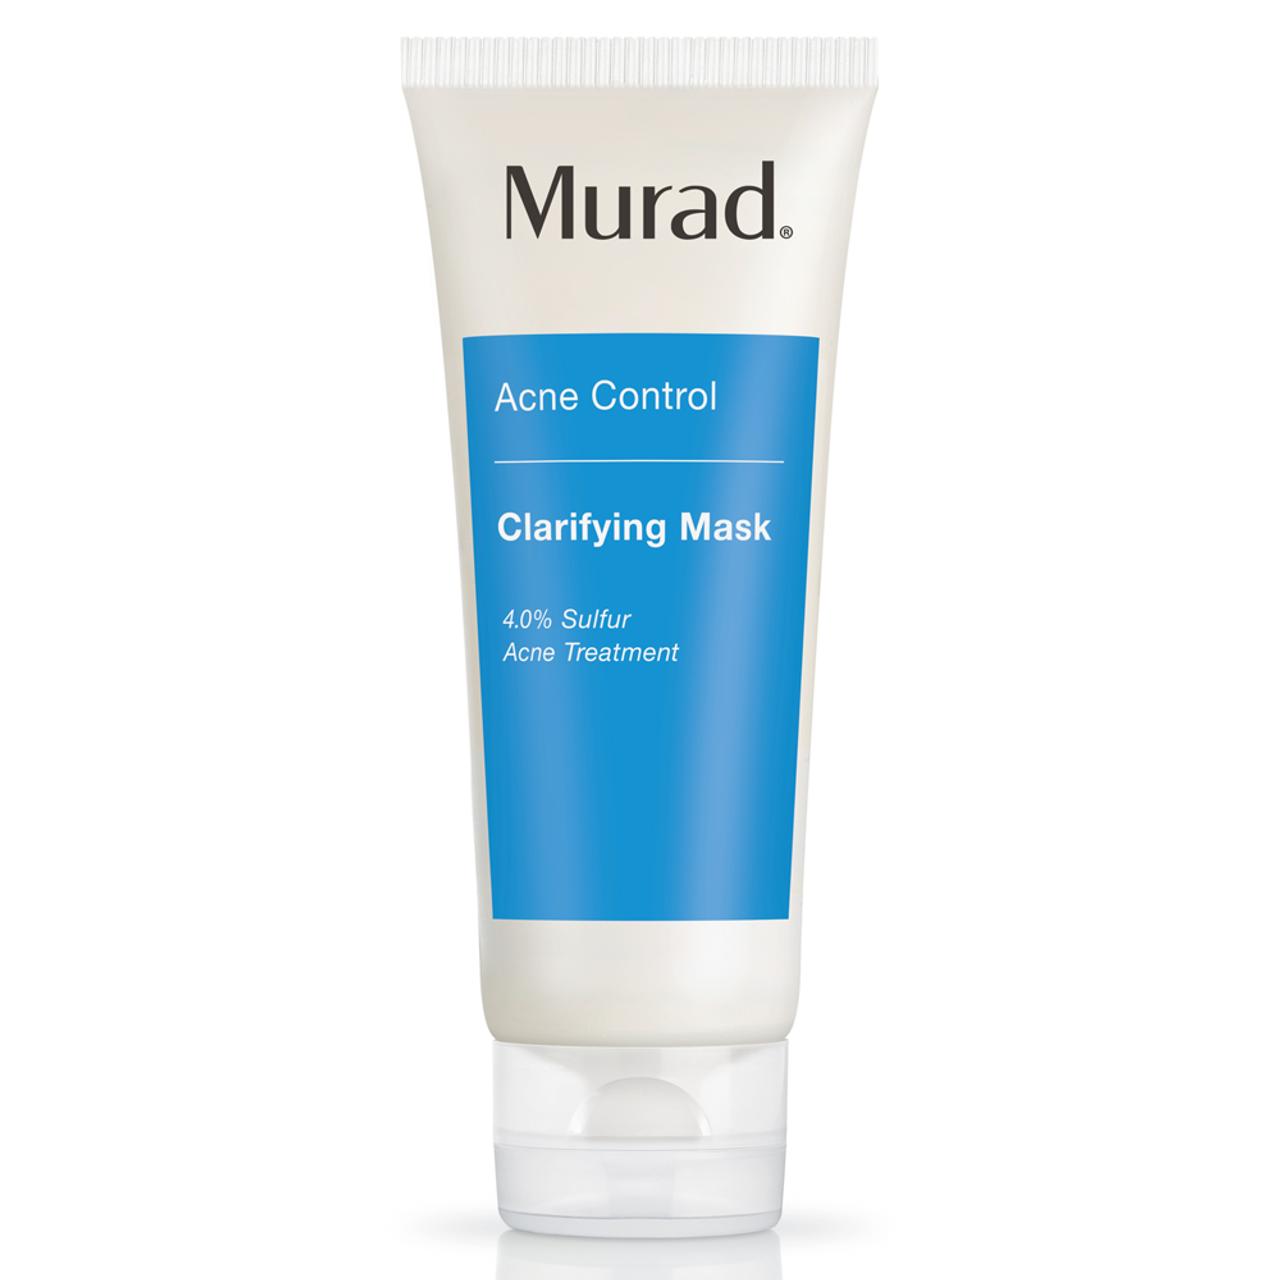 Murad Acne Control Clarifying Mask  BeautifiedYou.com